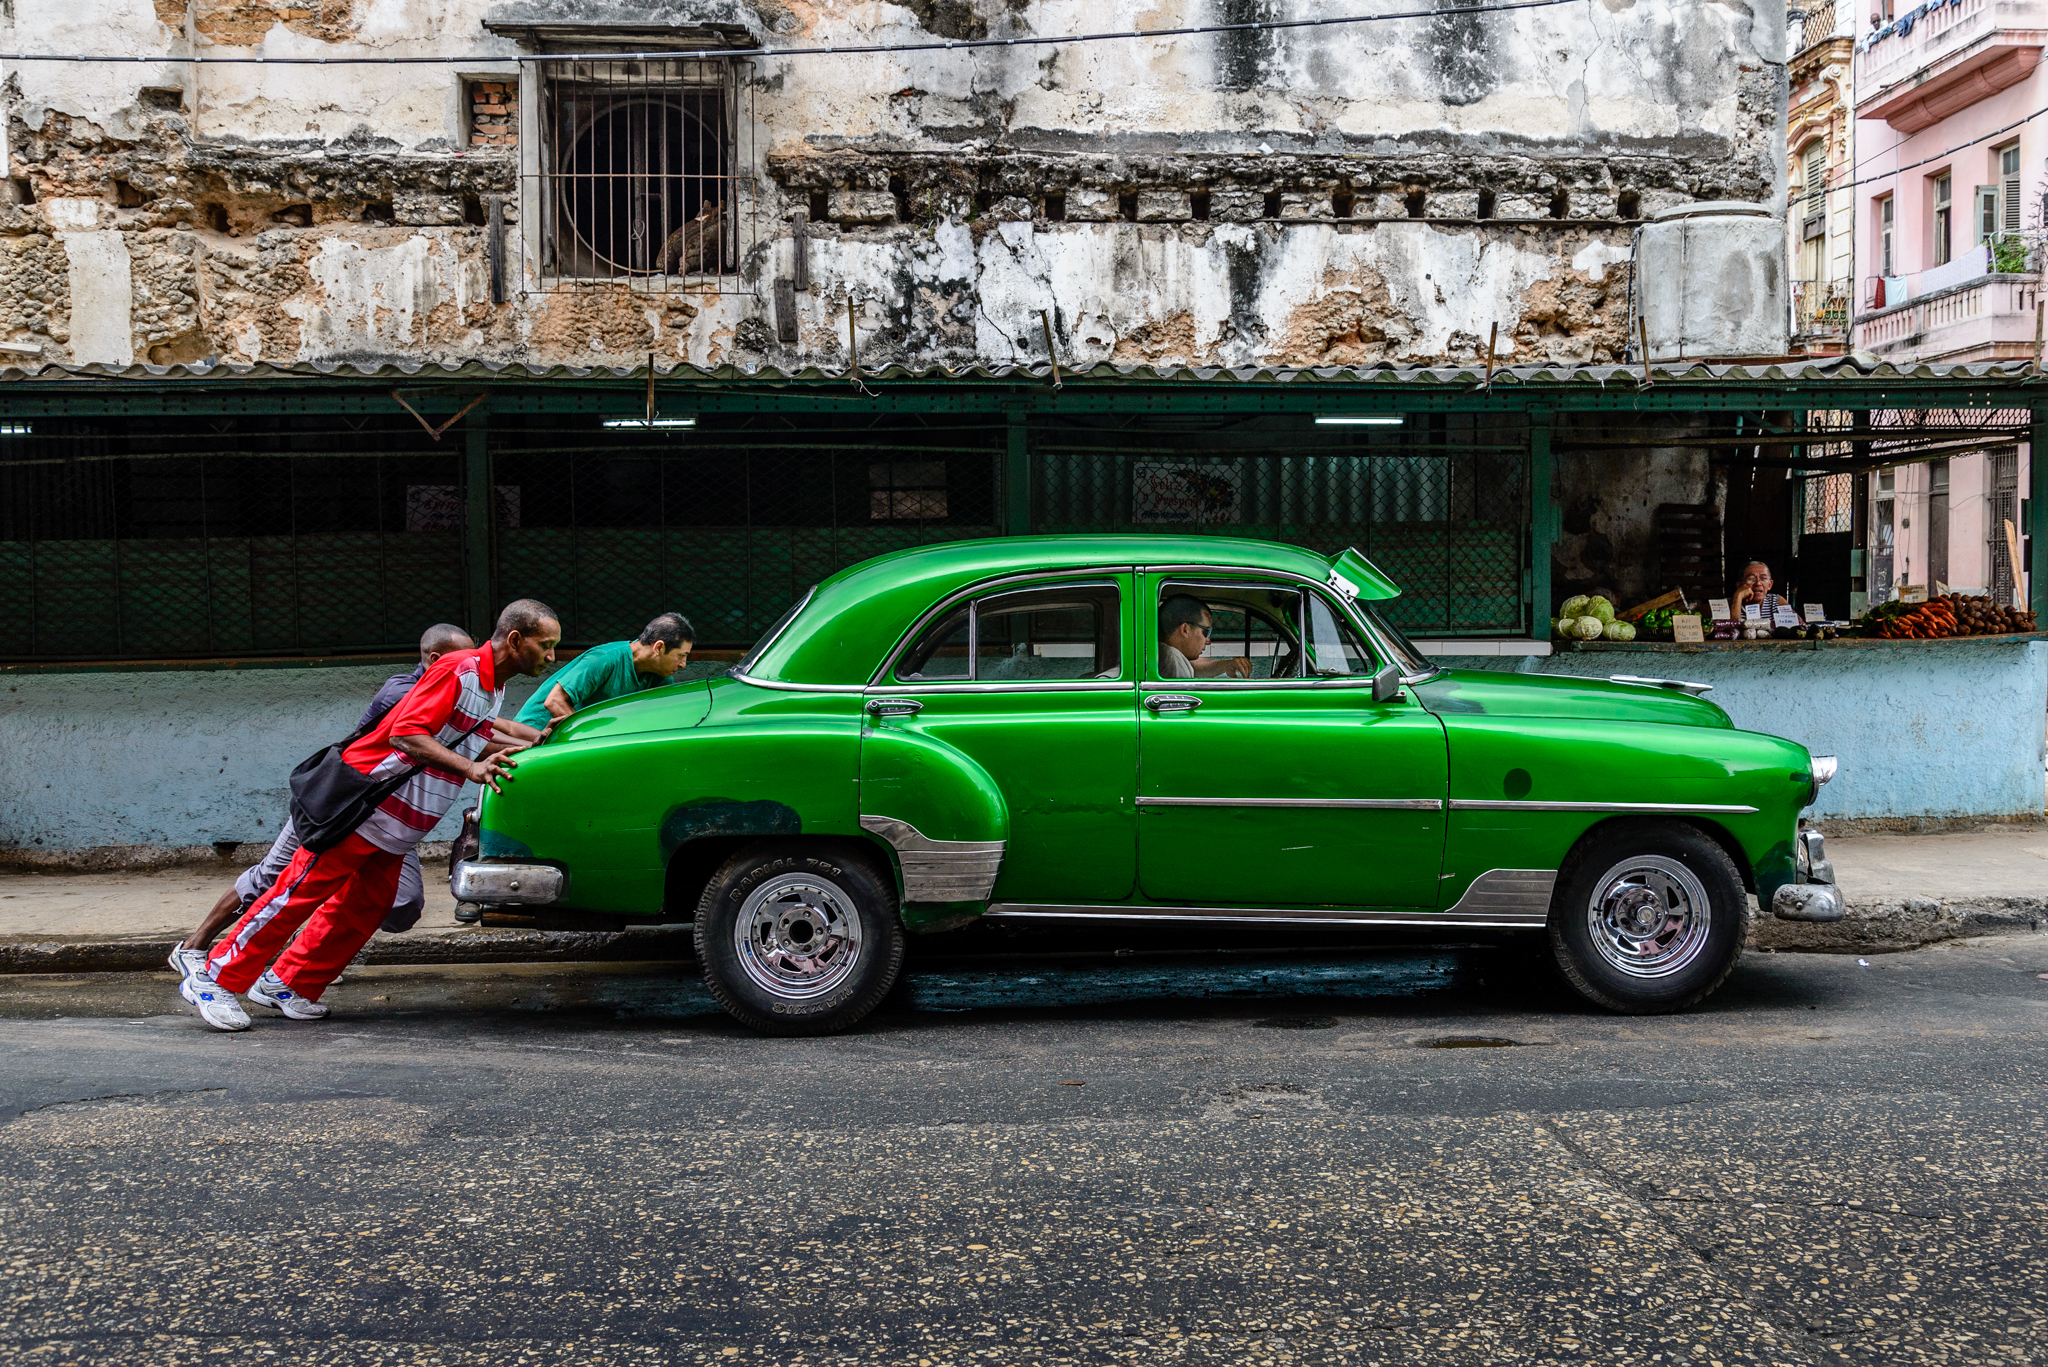 Rock and Roll - Havana - 2013